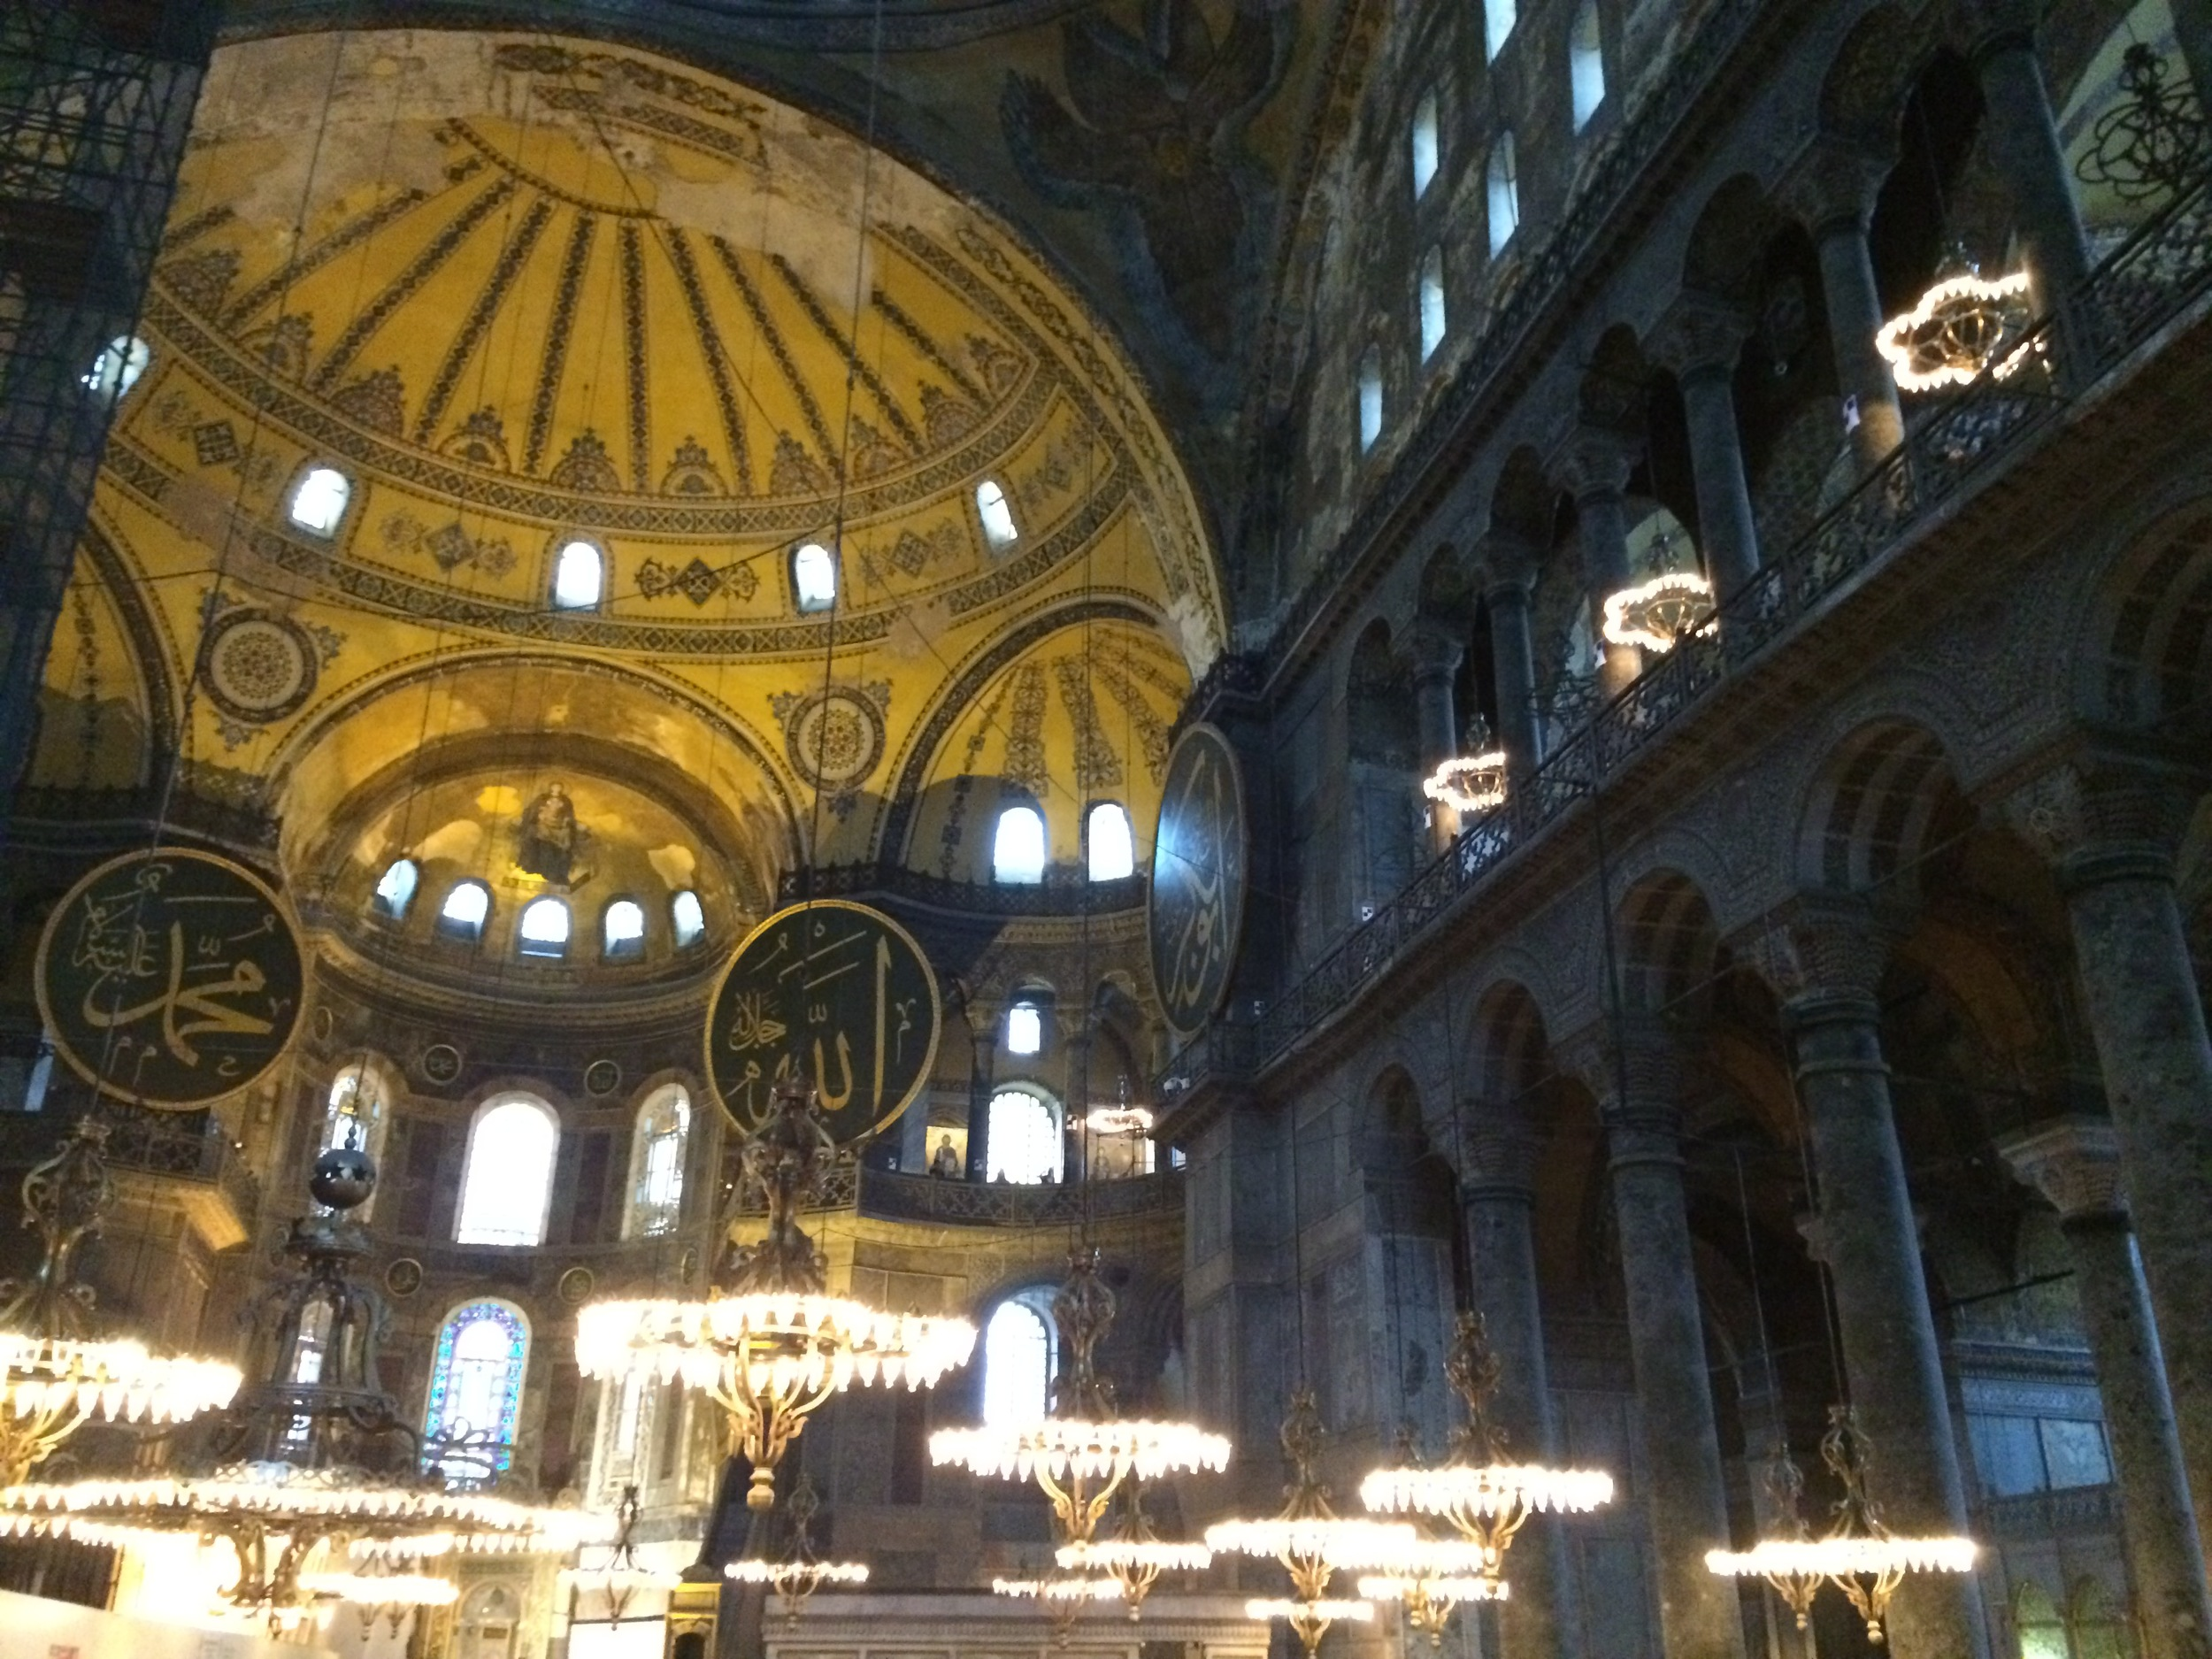 The interior of the Hagia Sophia.